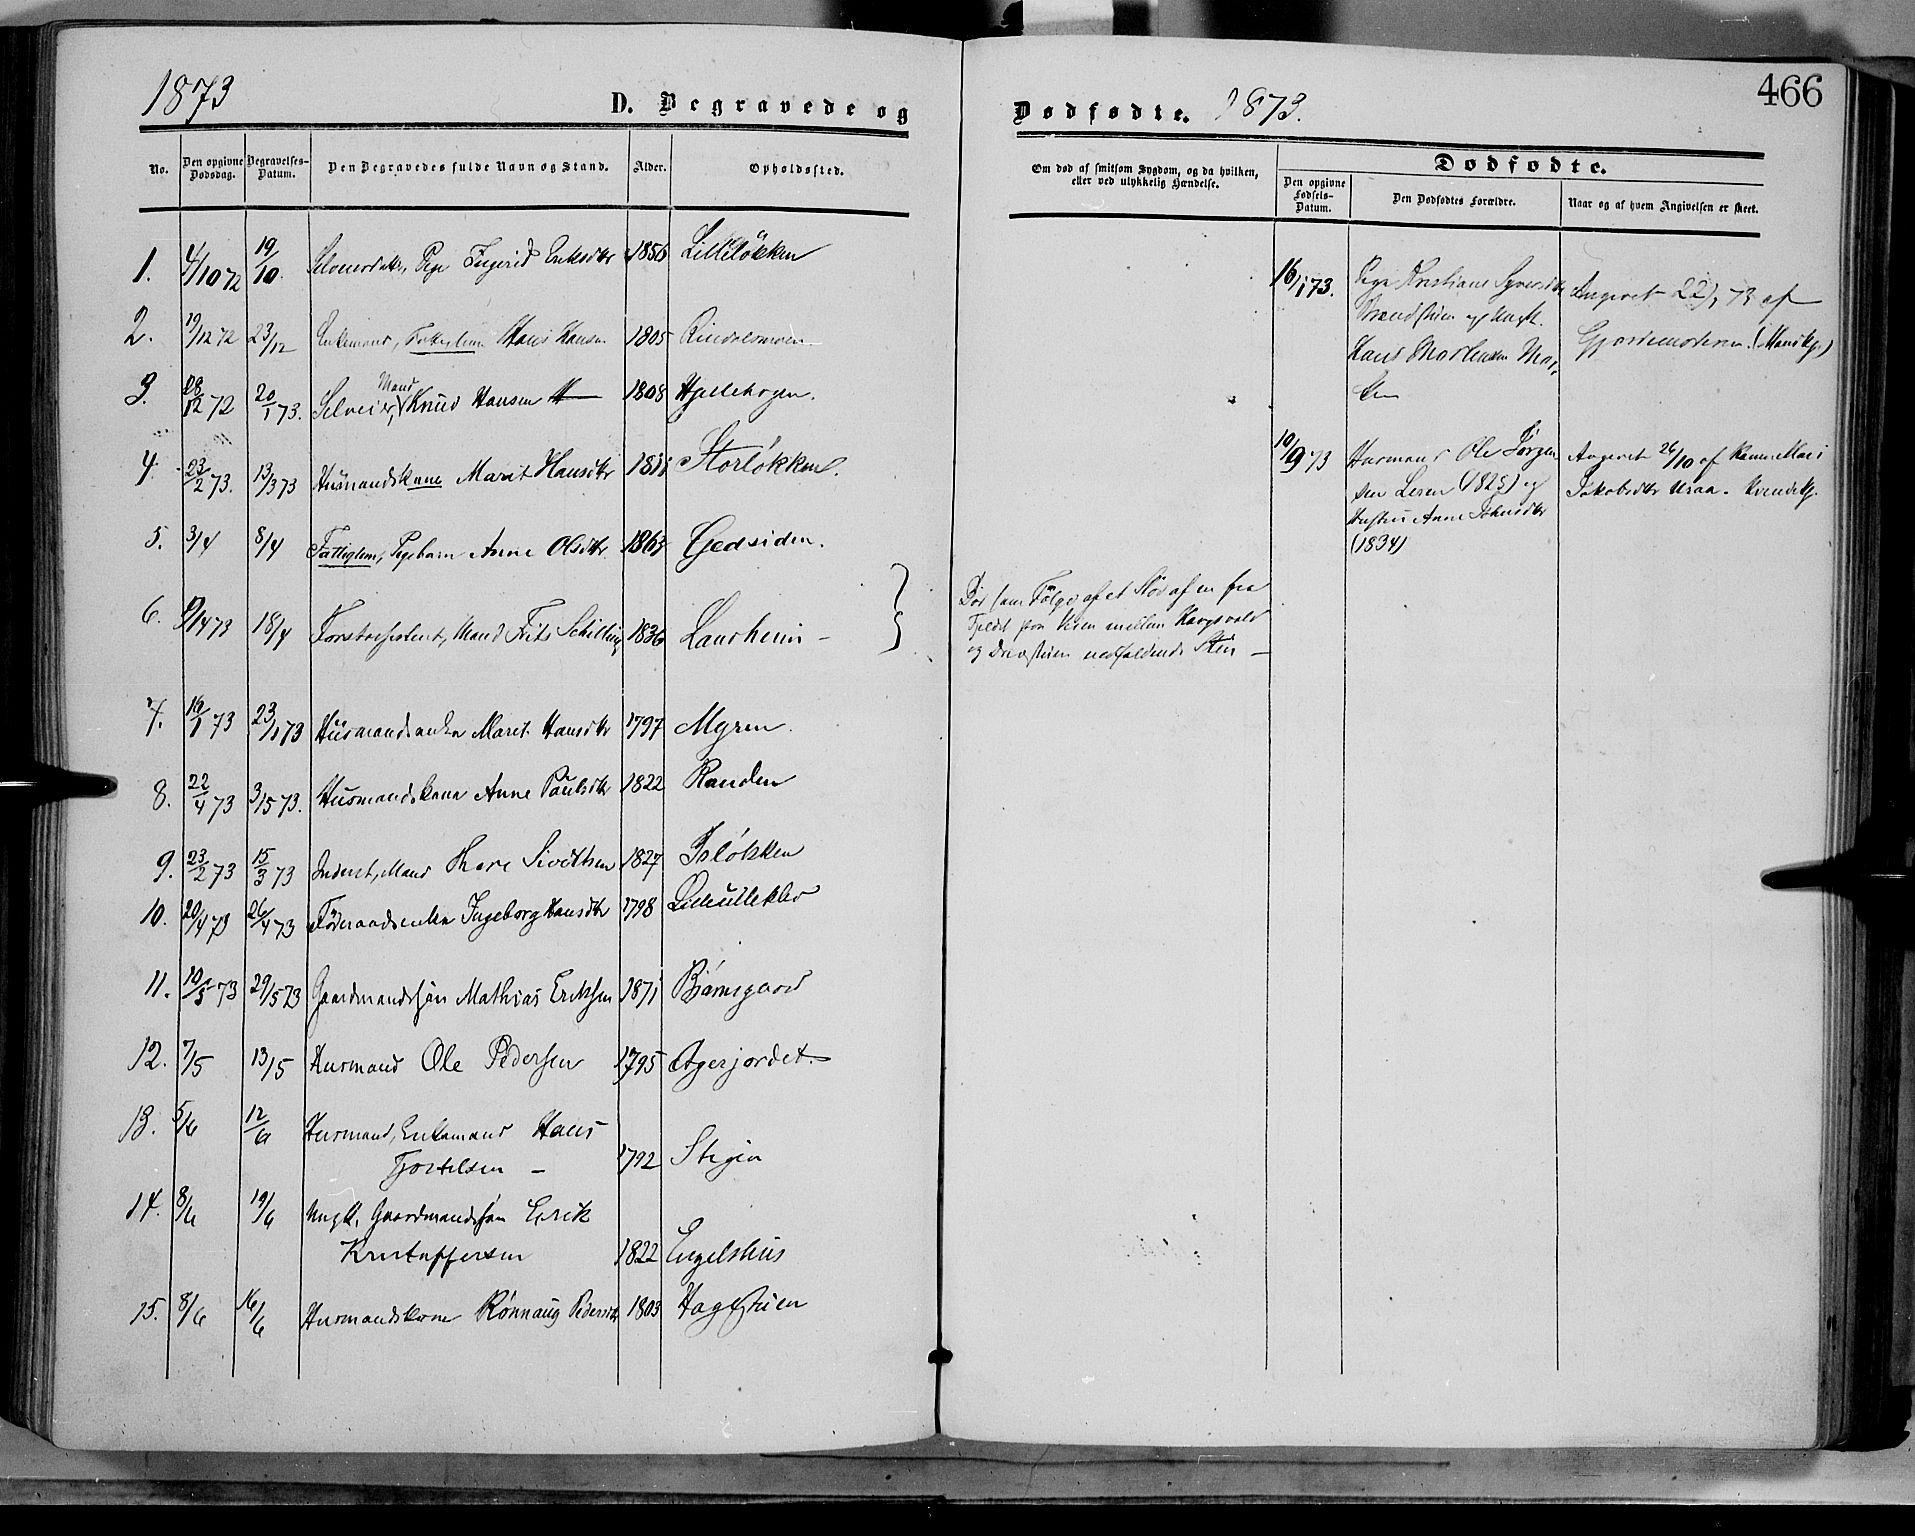 SAH, Dovre prestekontor, Ministerialbok nr. 1, 1854-1878, s. 466